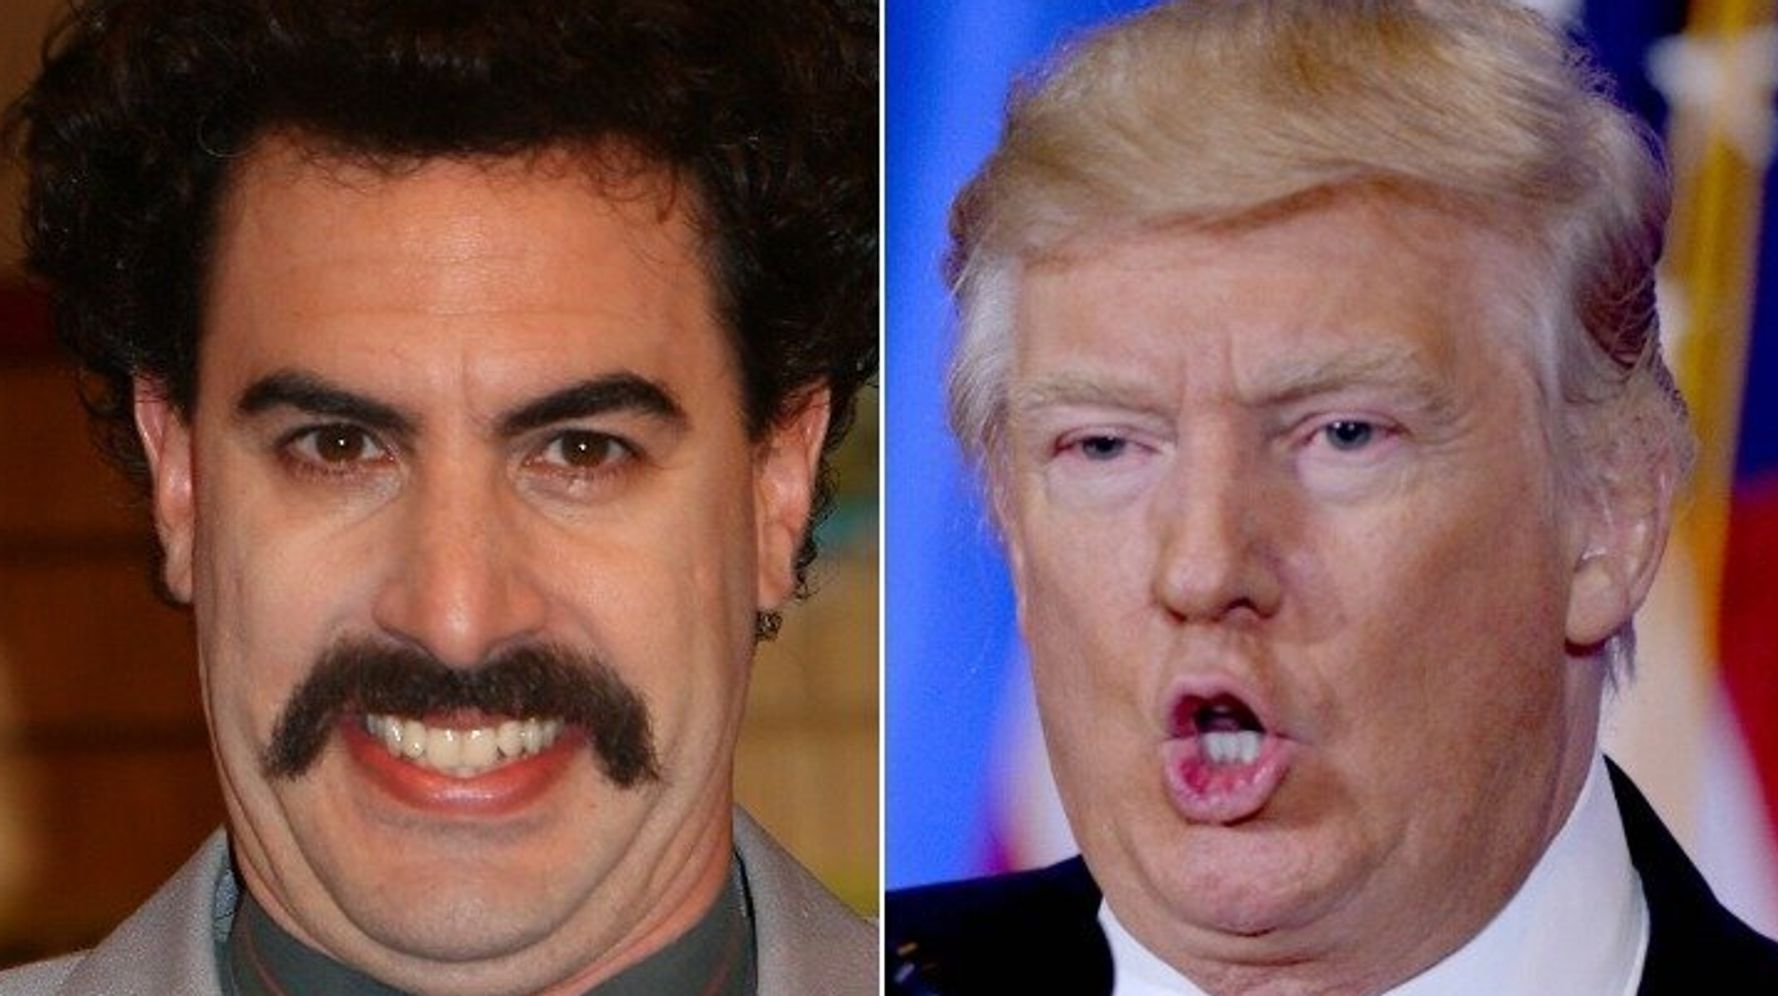 Trump Lashes Out At 'Borat' Creator Sacha Baron Cohen: 'He's A Creep'